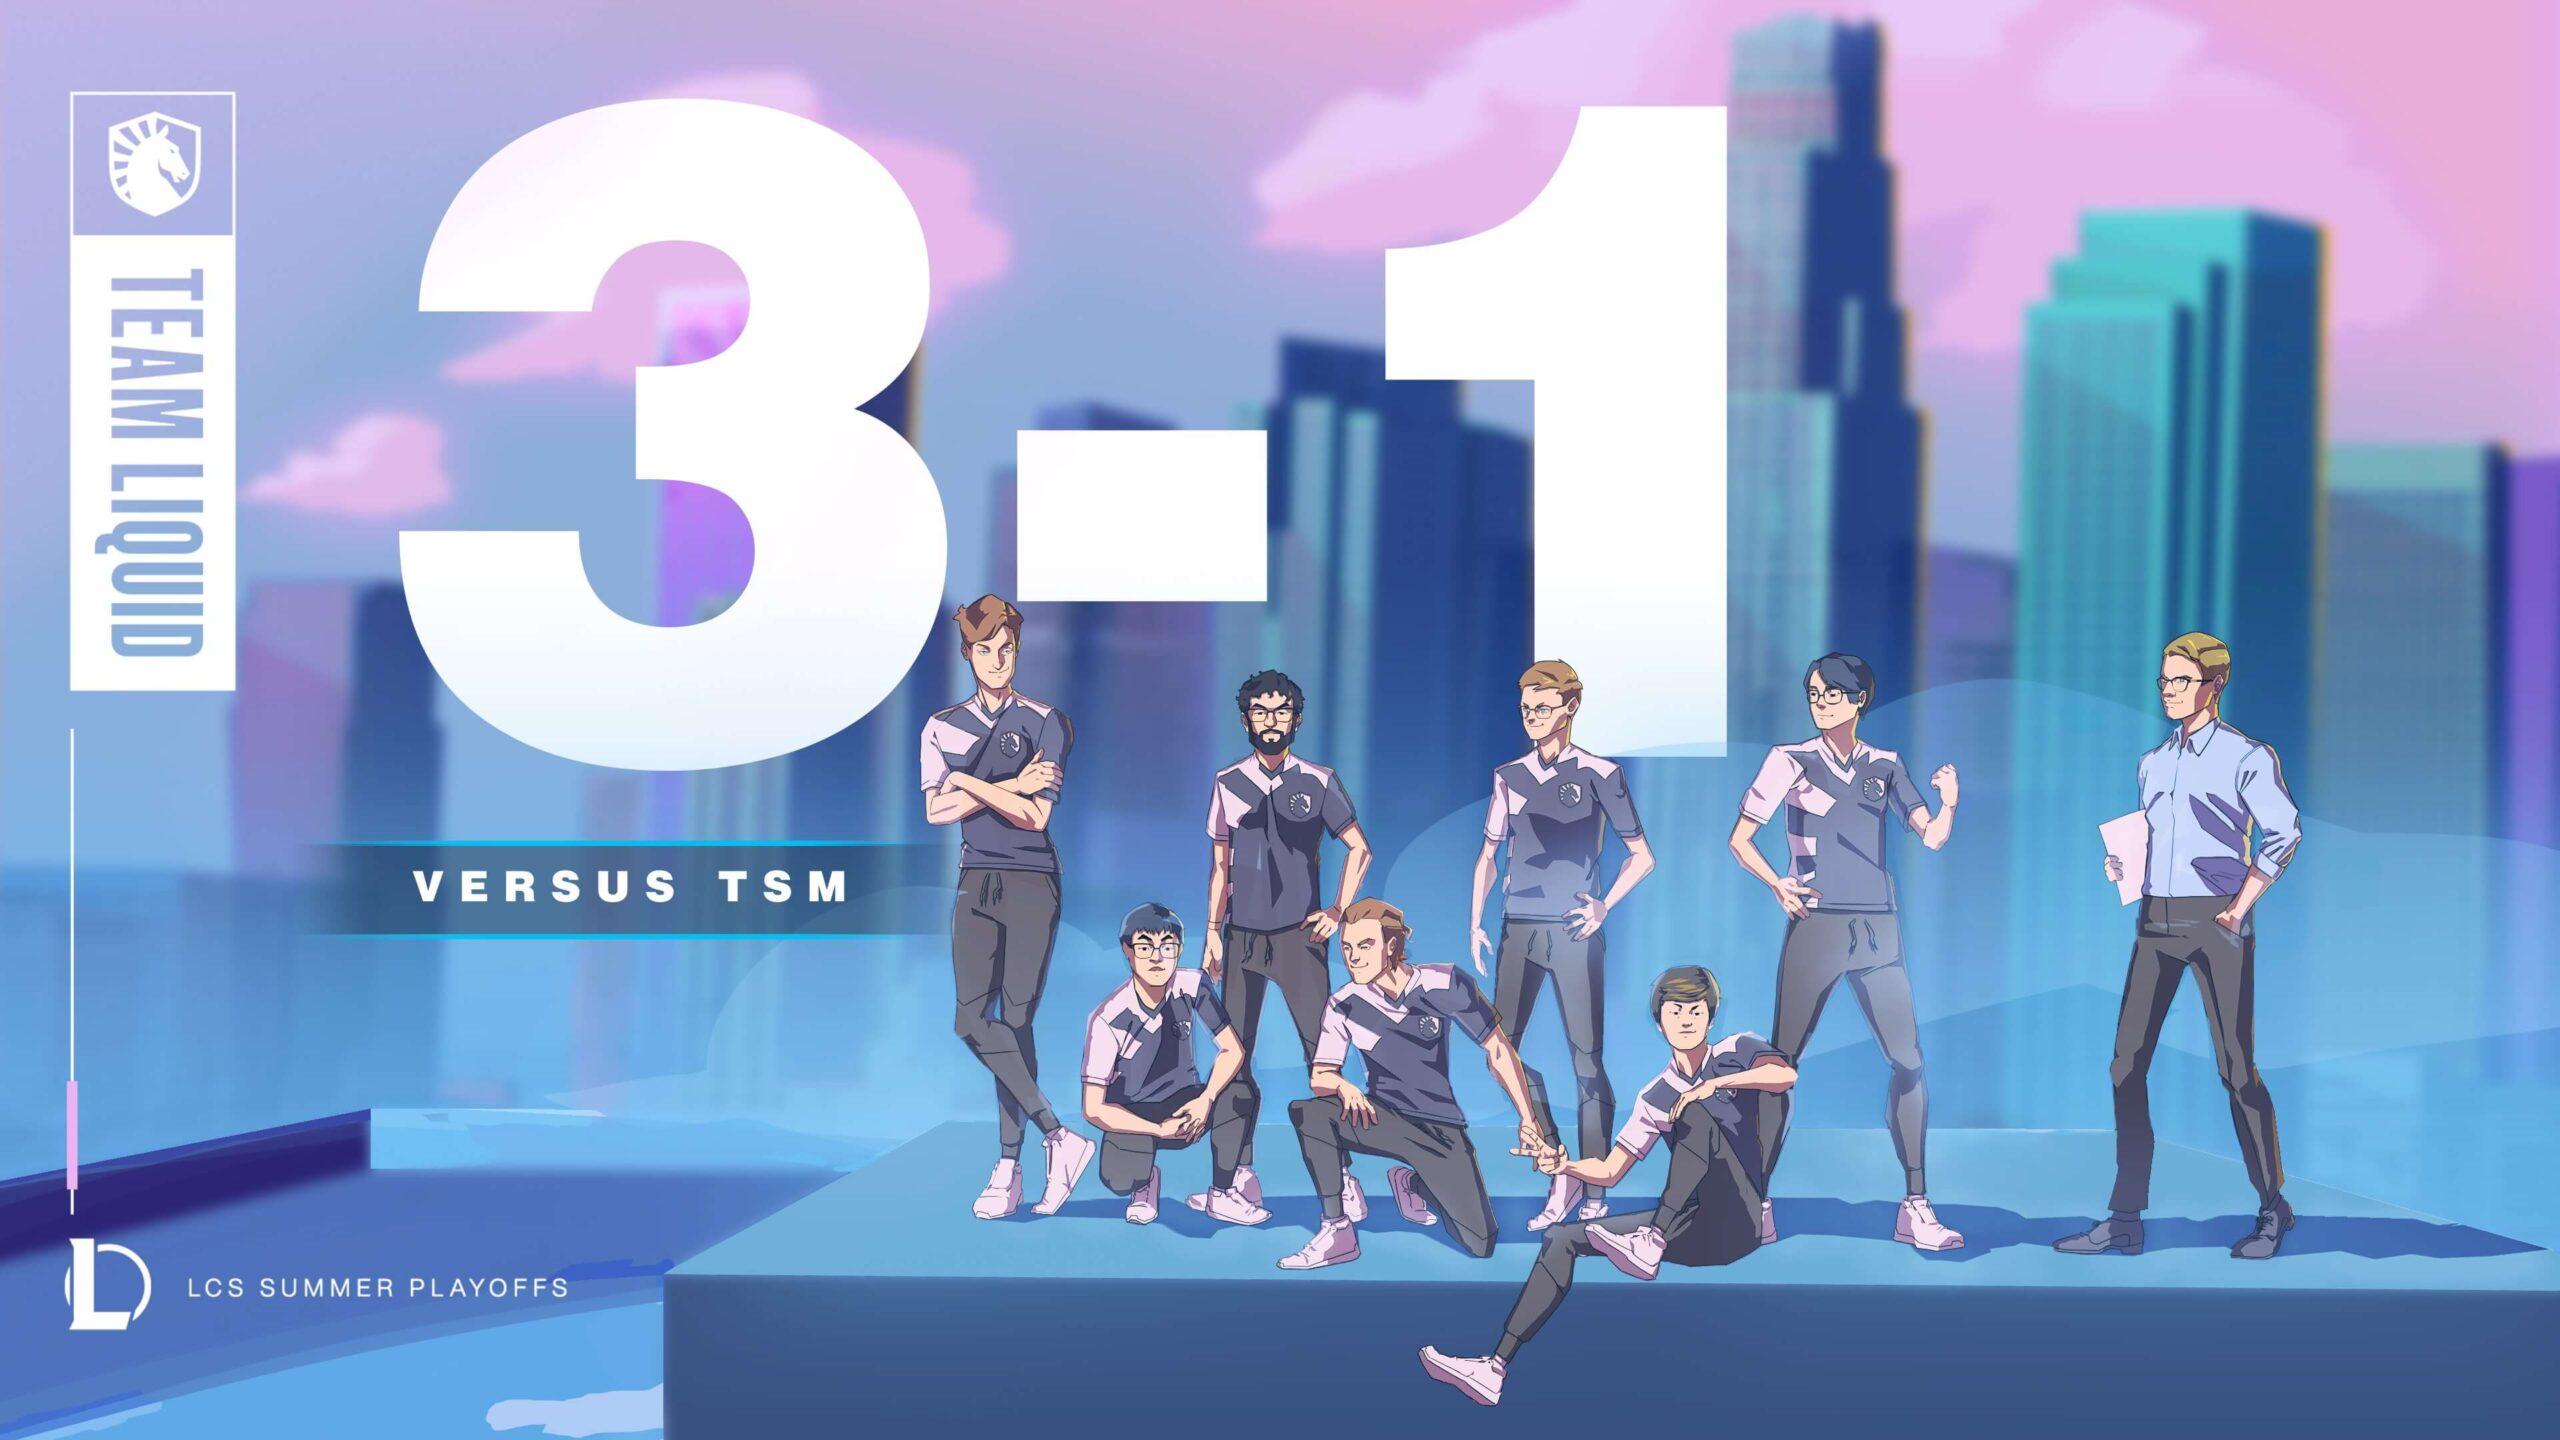 Team Liquid TSM